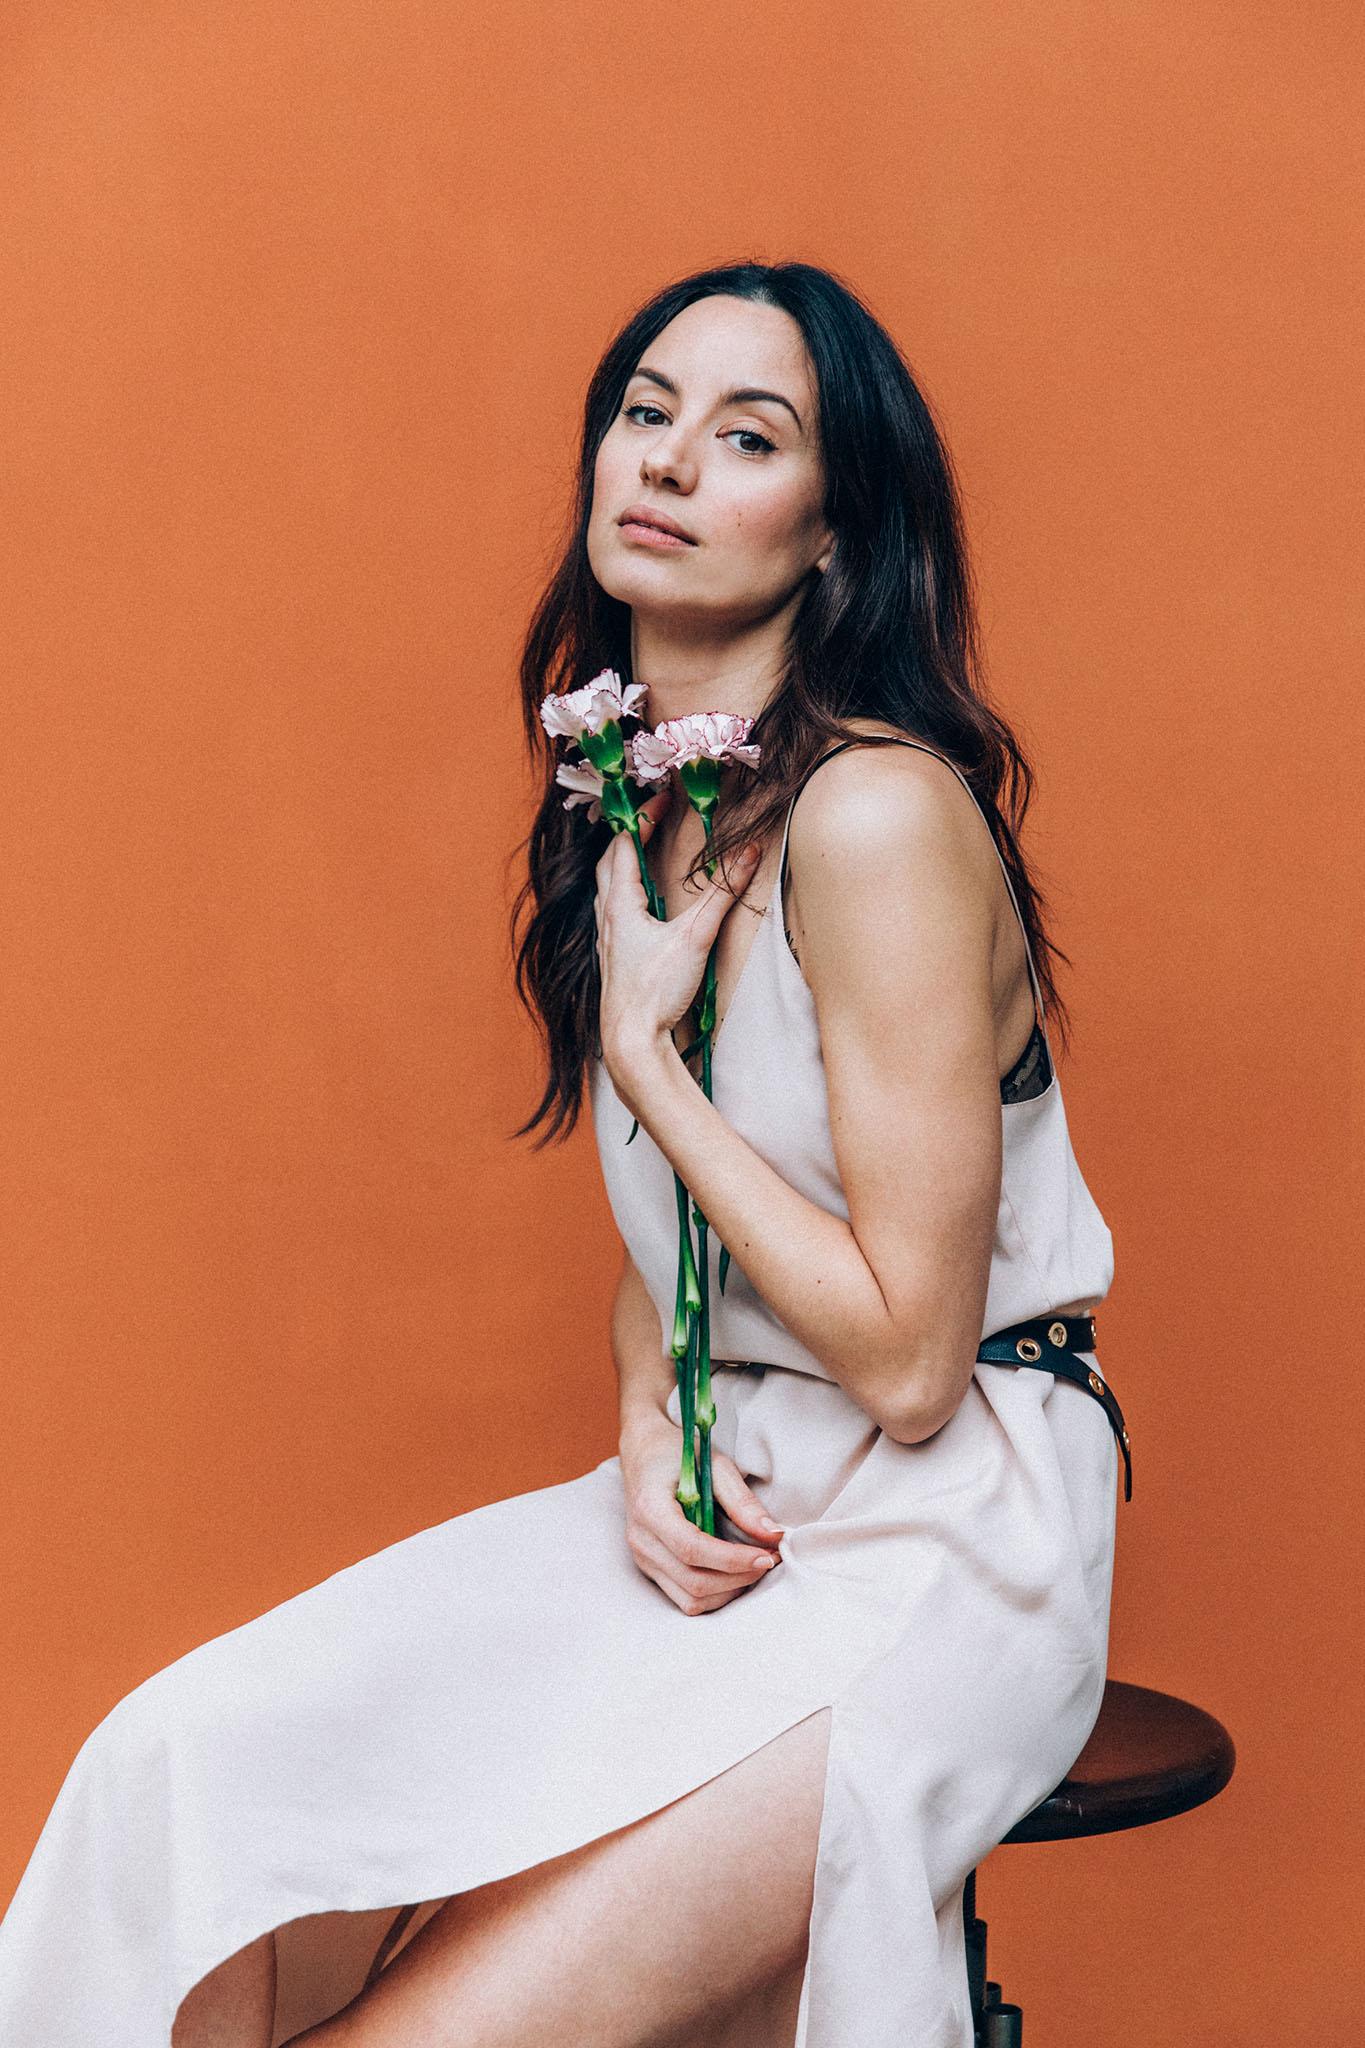 20190308-musasenflor-cristina-guillen-01.jpg